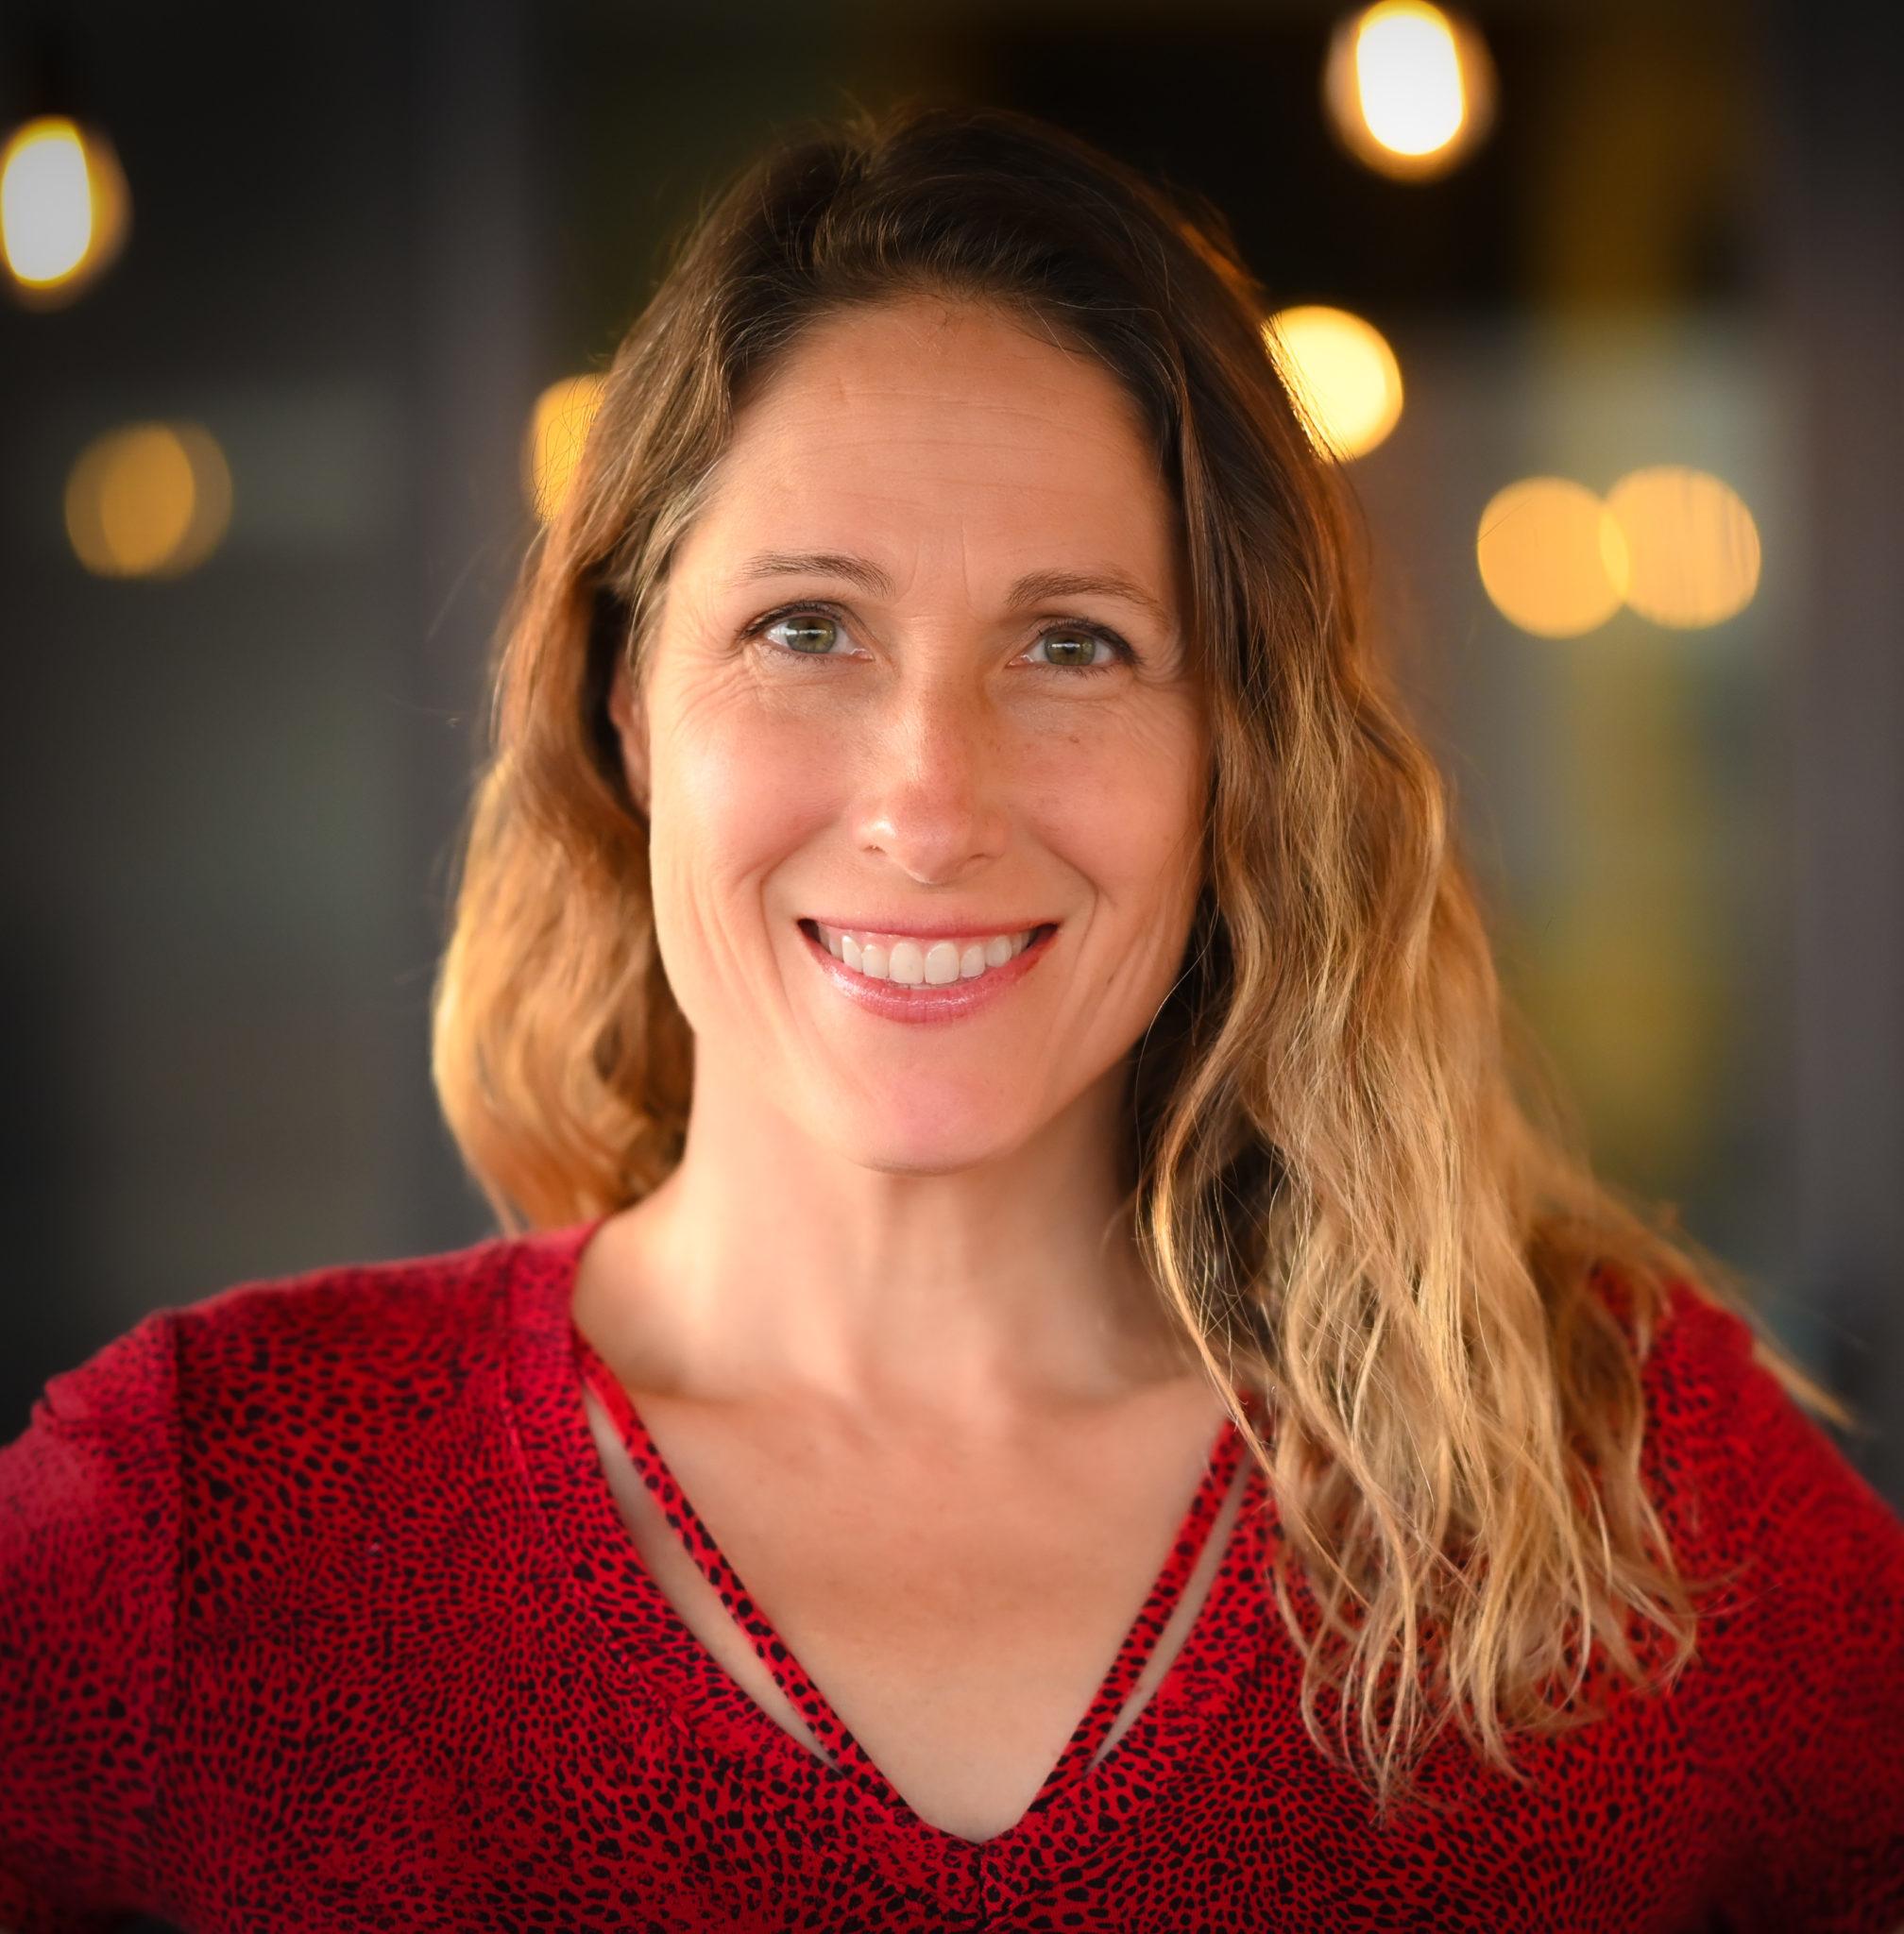 Amy Nielson Biesinger